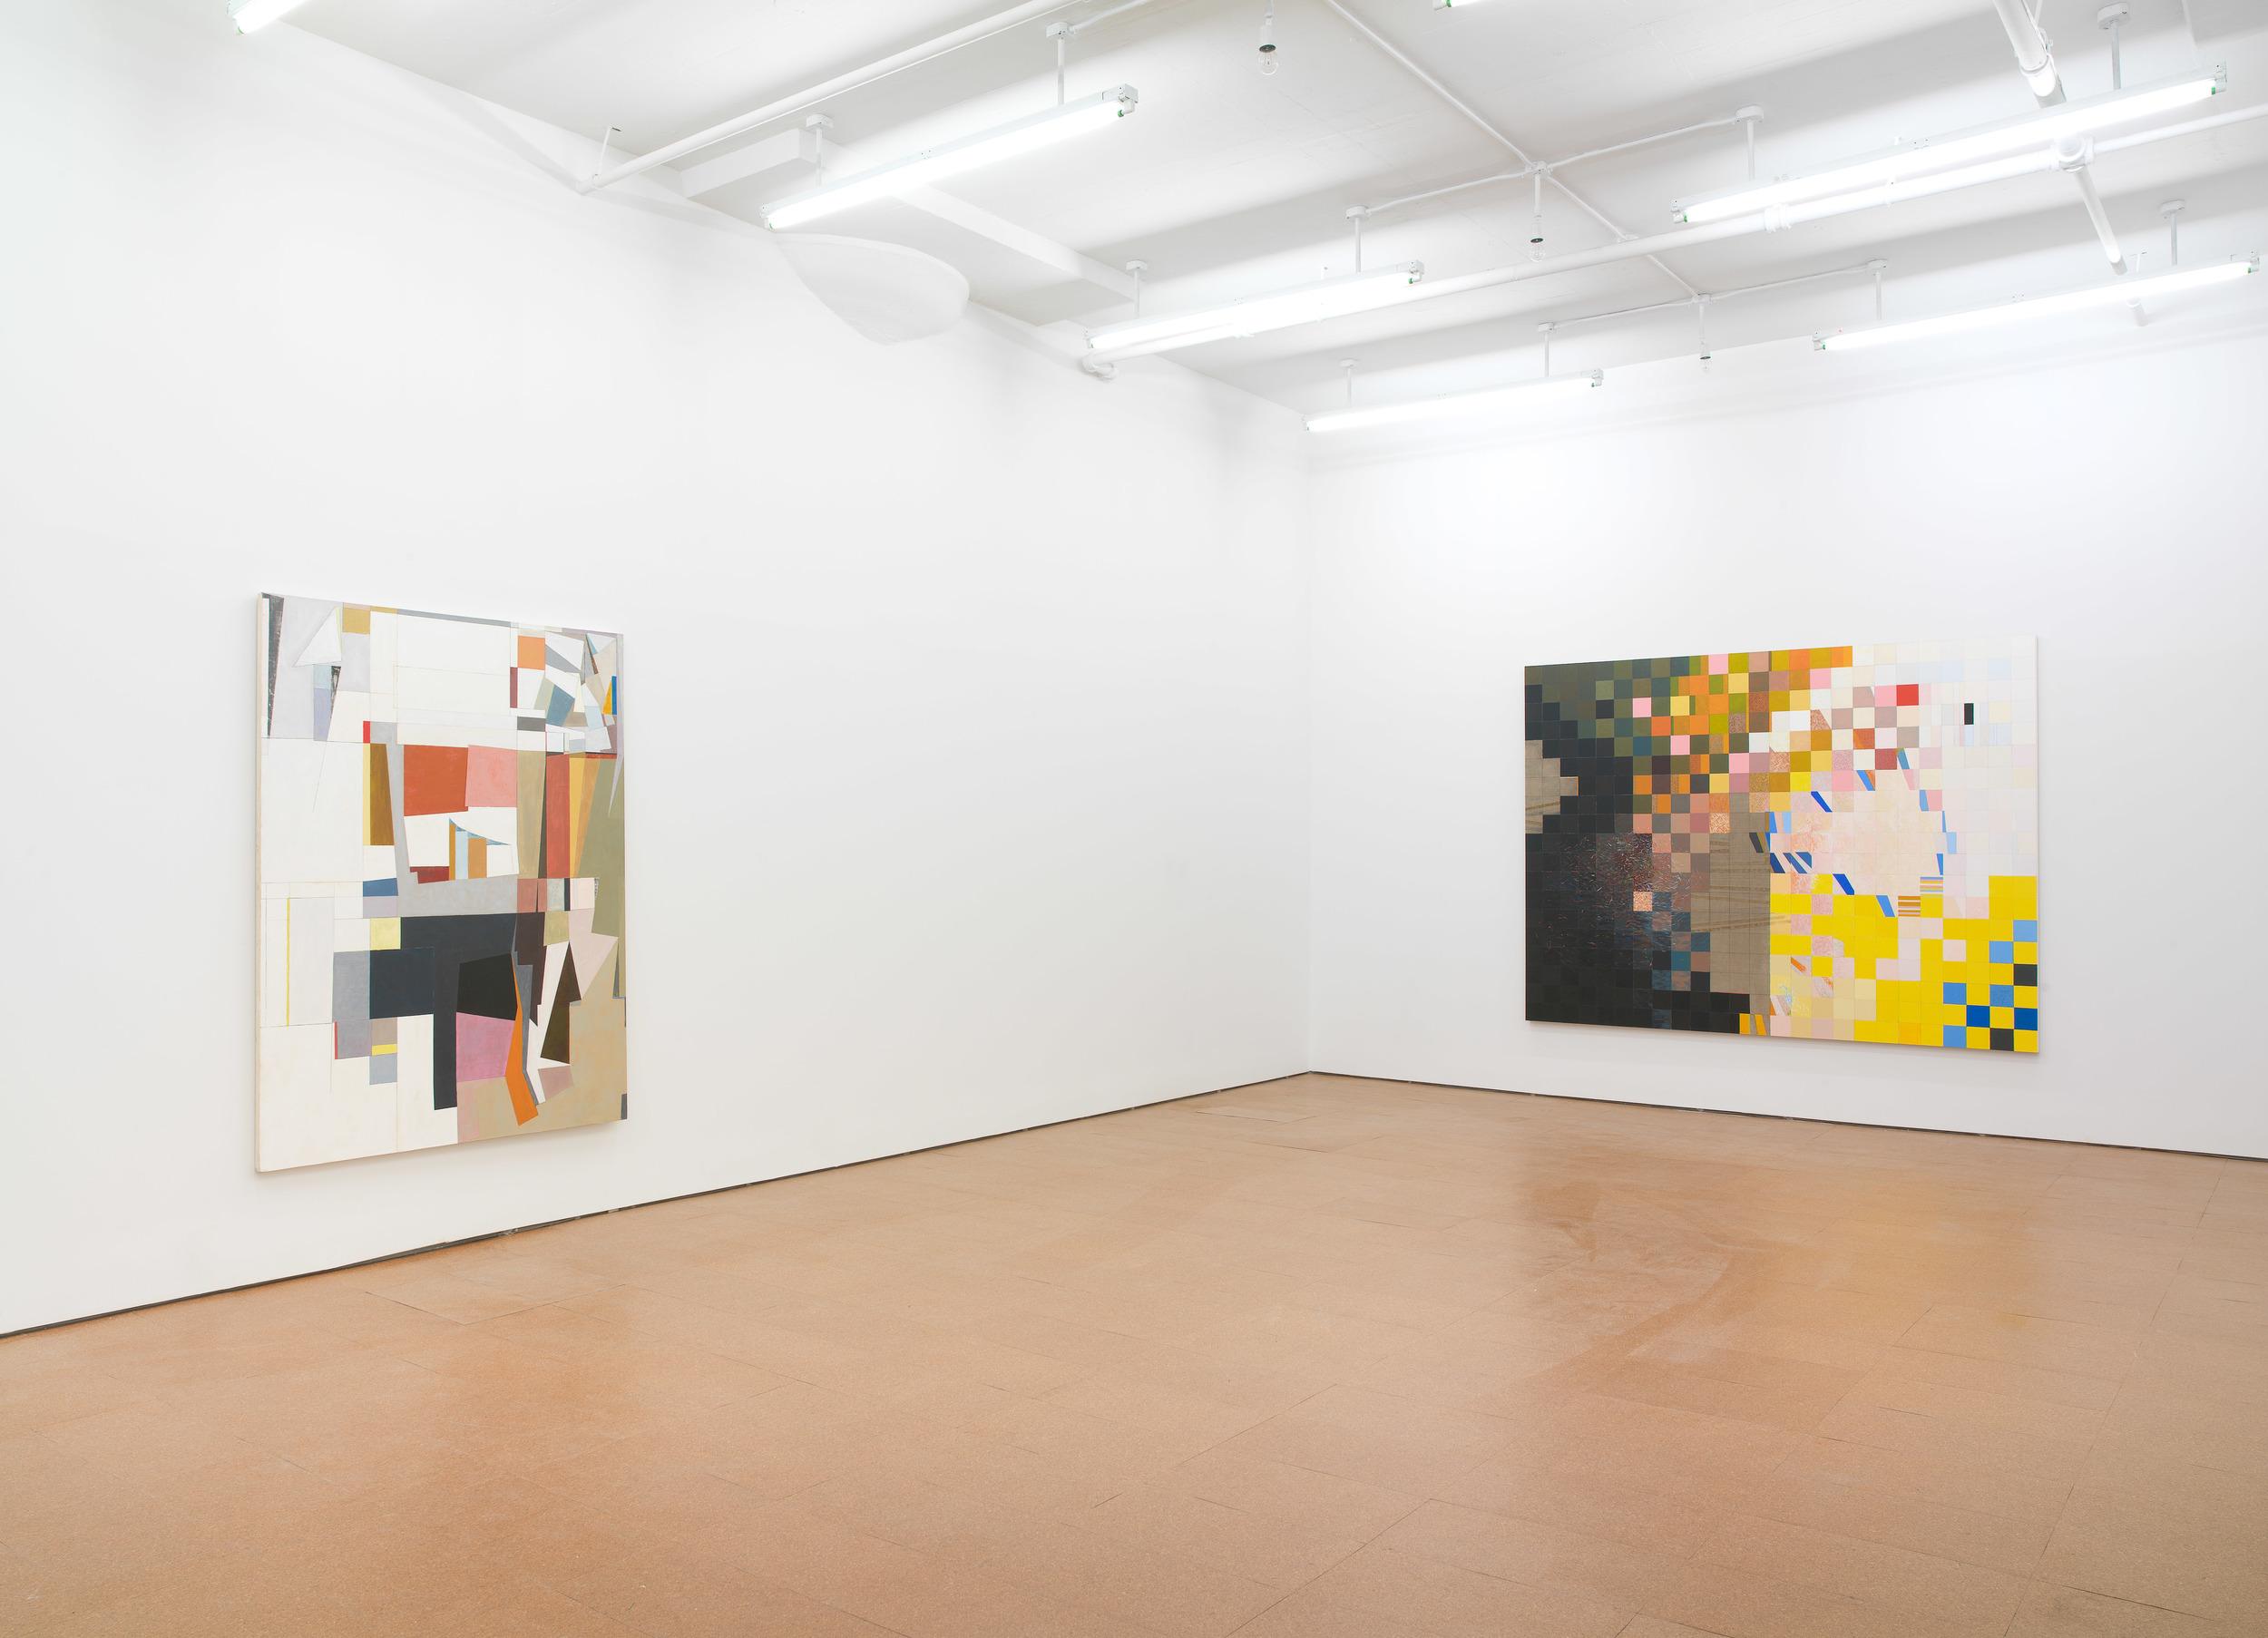 2010: Jeremy Gilbert-Rolfe at Alexander Gray Associates, New York